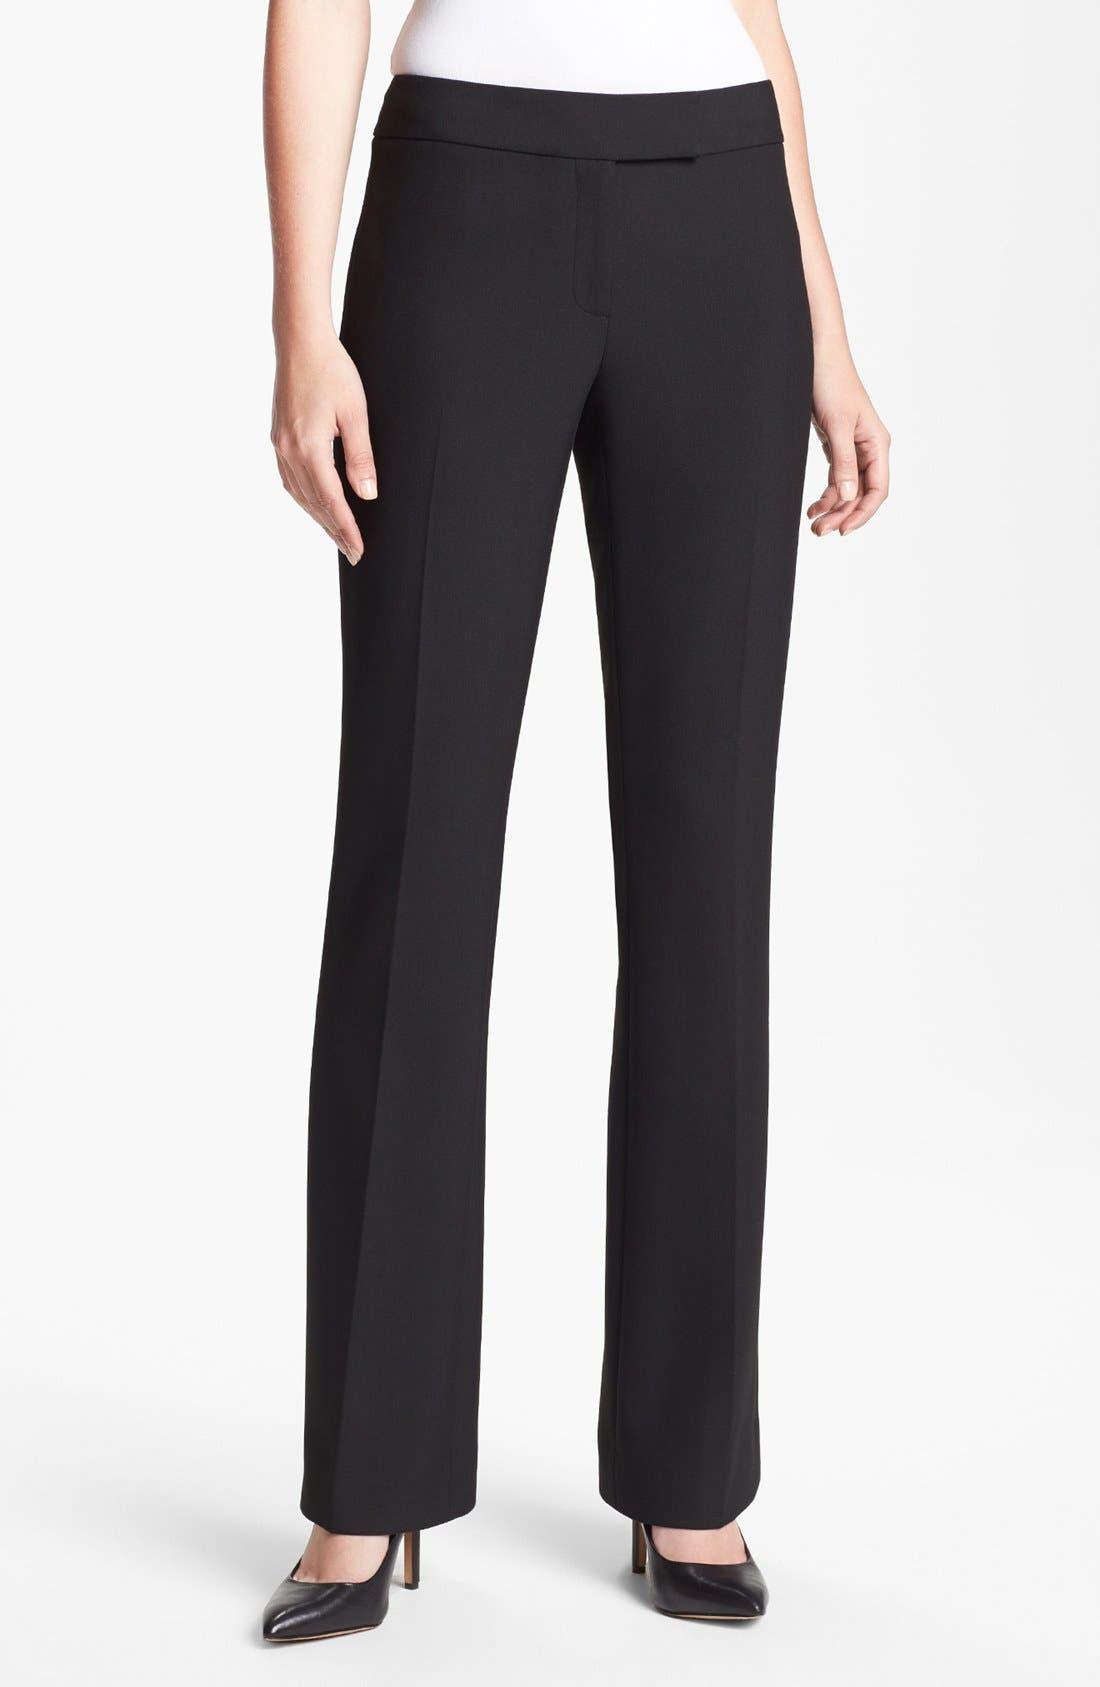 Alternate Image 1 Selected - Classiques Entier® 'City Weave' Trousers